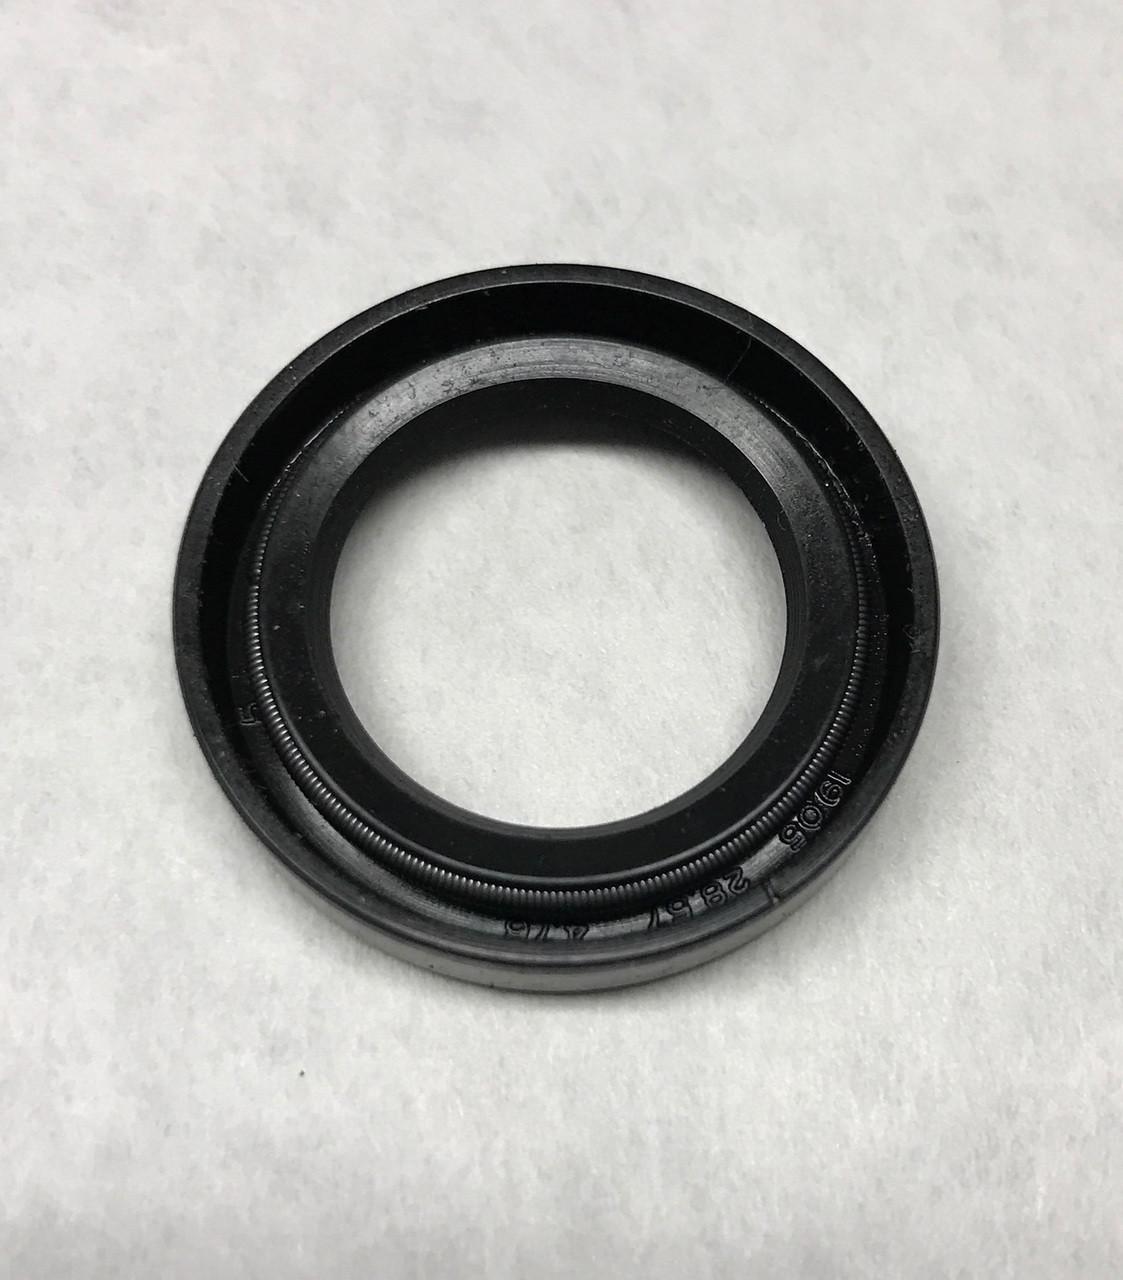 444 -- (#24) -- Oil Seal - 1035195